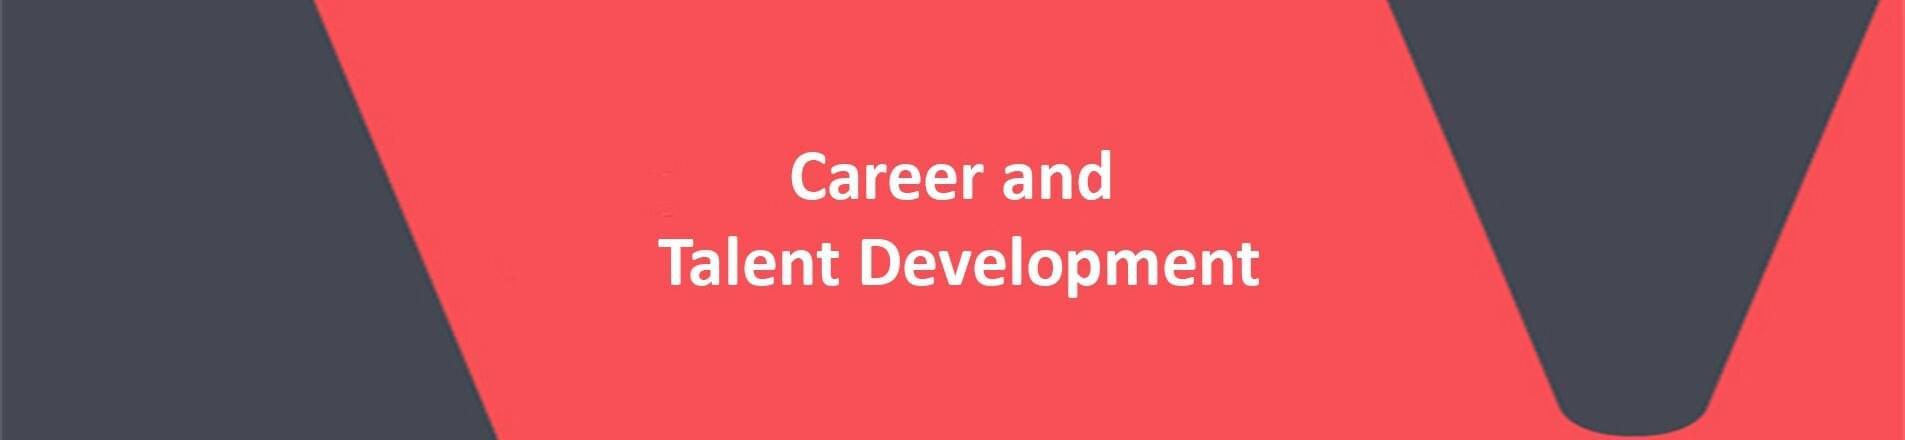 Career and Talent Development.